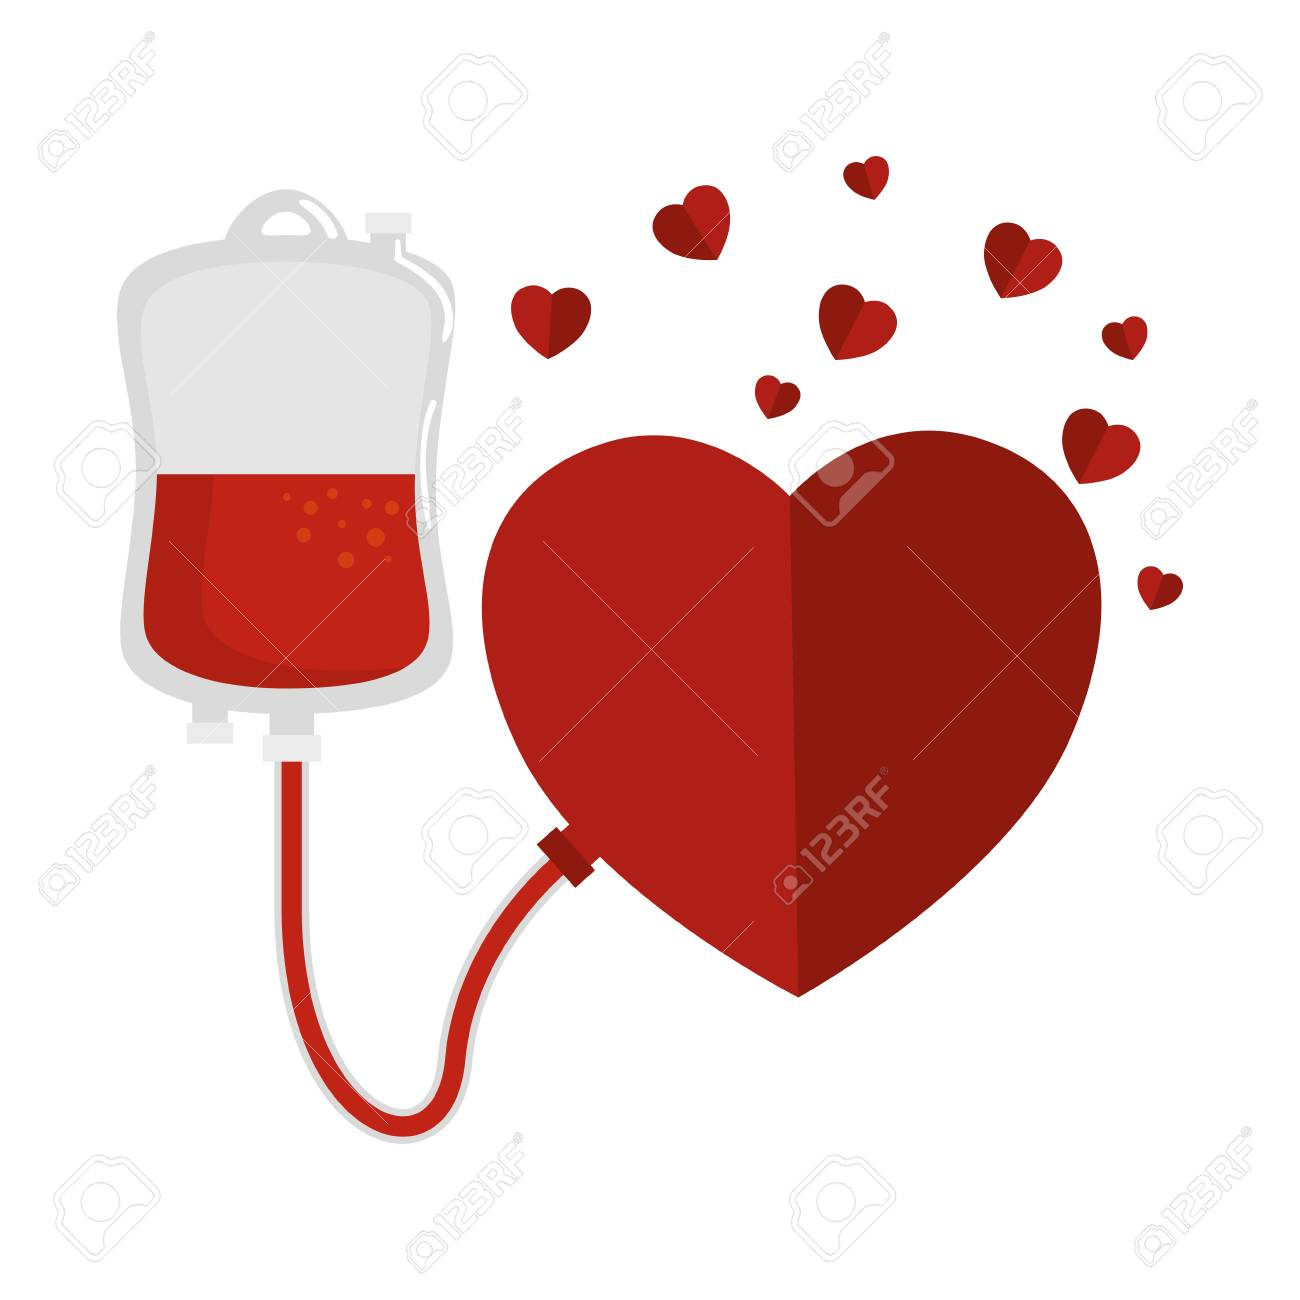 blood donation bag and hearts vector illustration design - 109886598